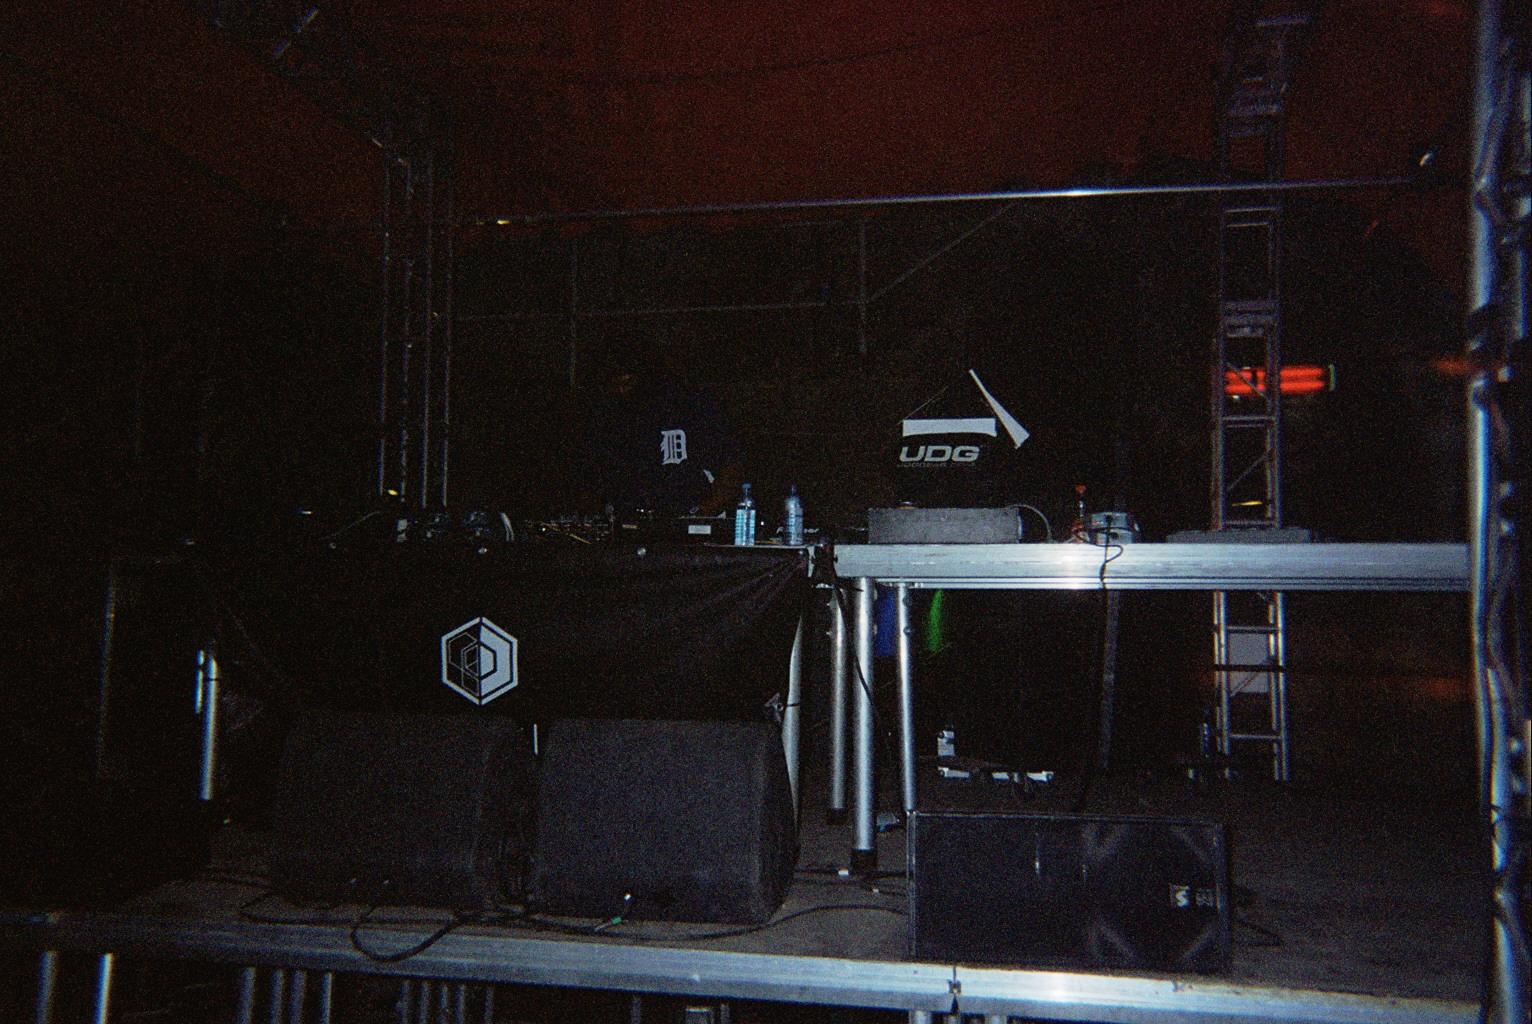 Le set le plus dark (lol): DJ STINGRAY